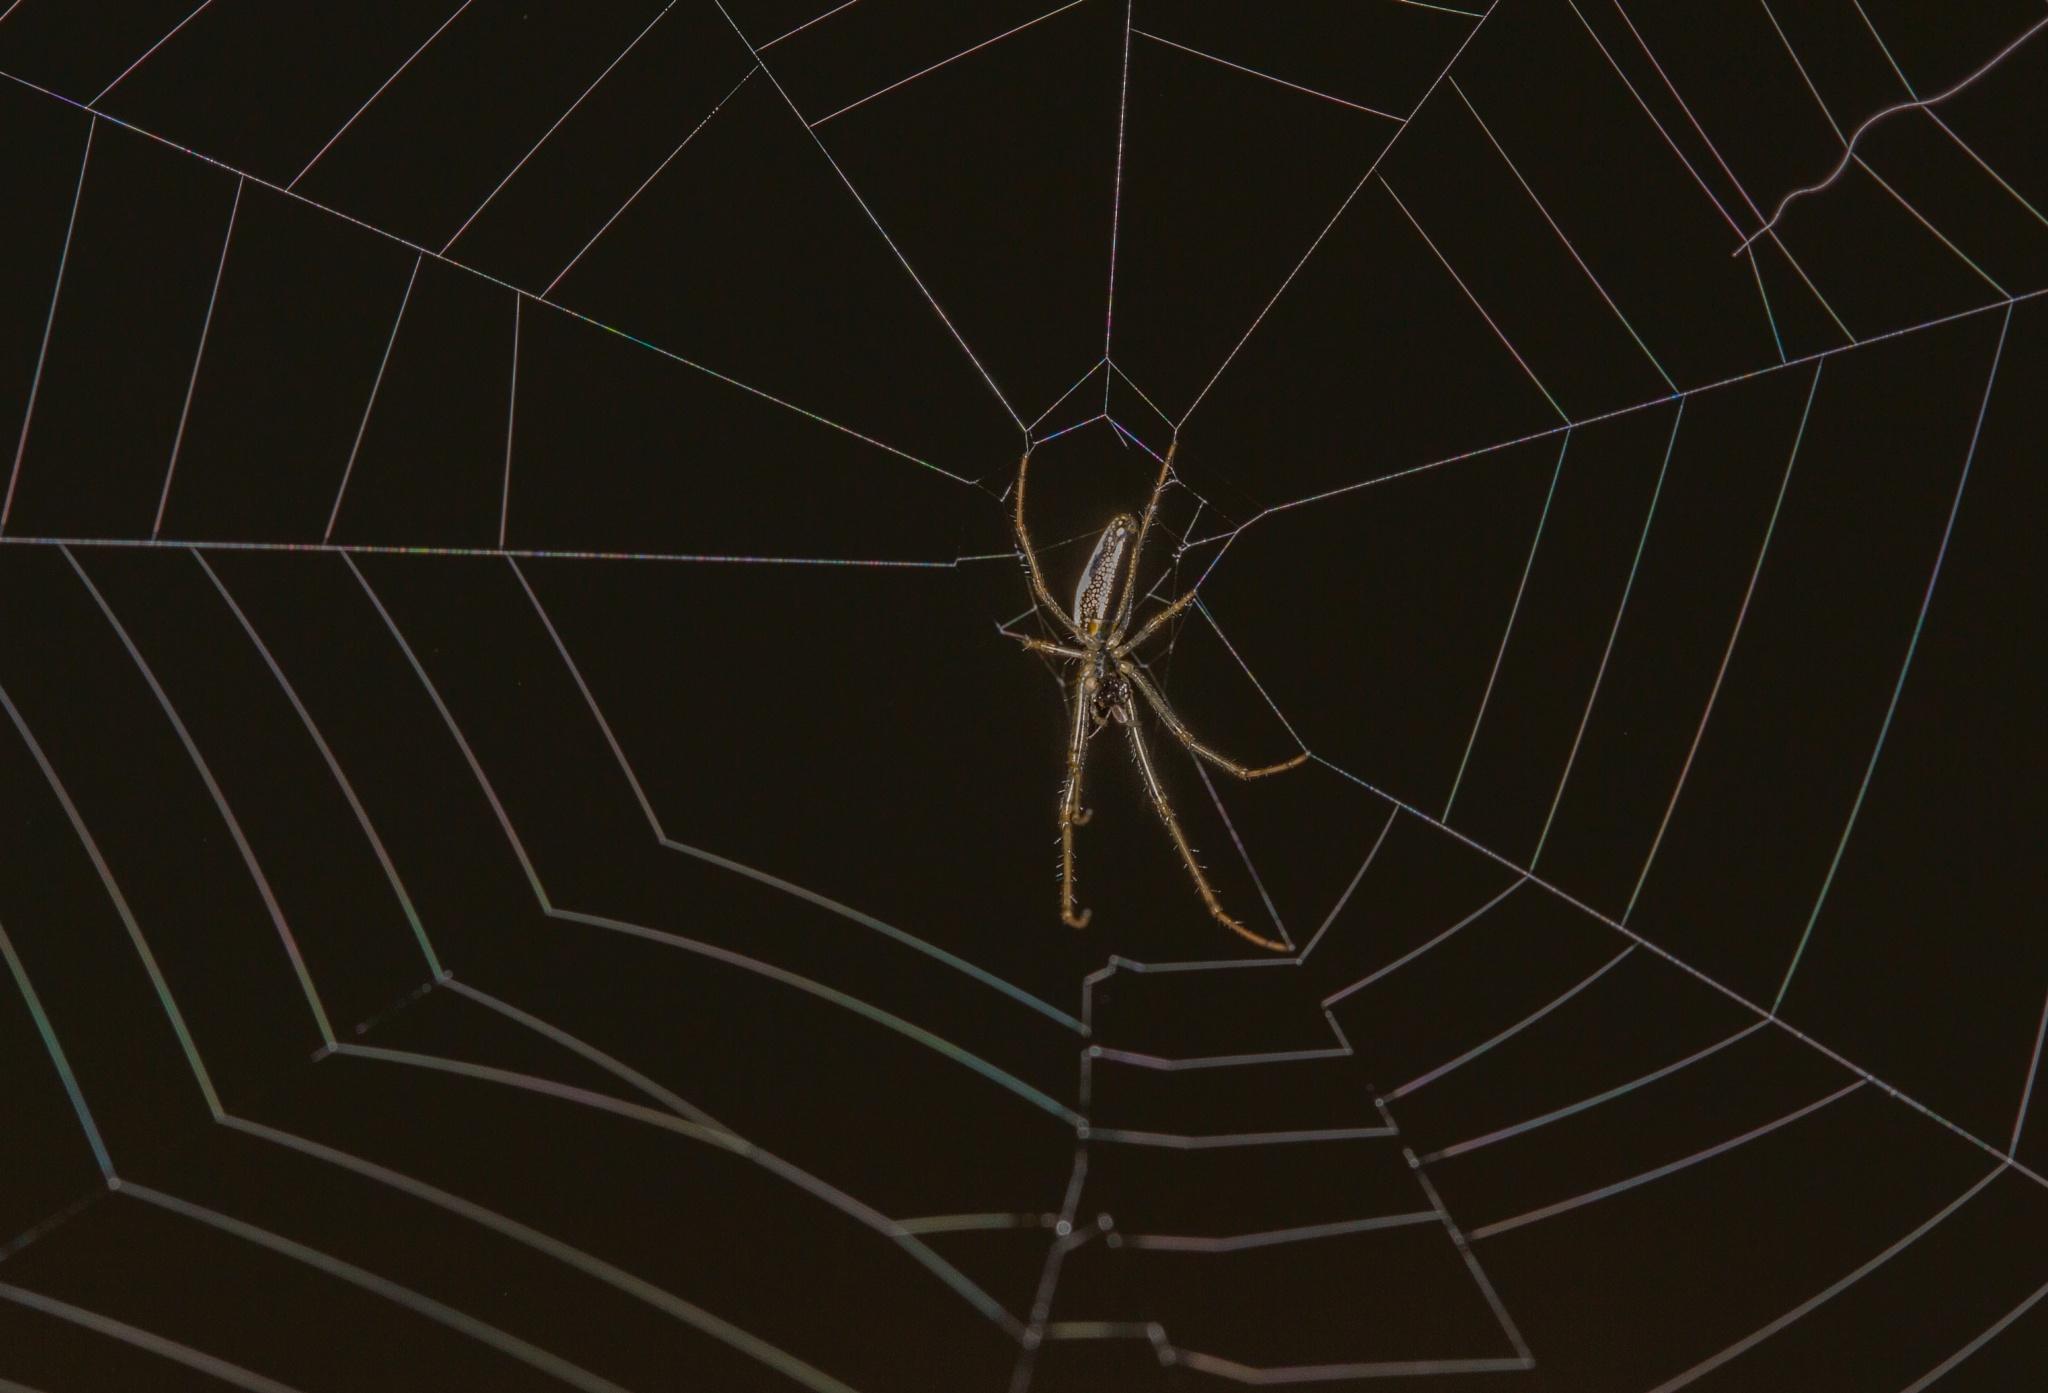 Spider by Philip Cooper